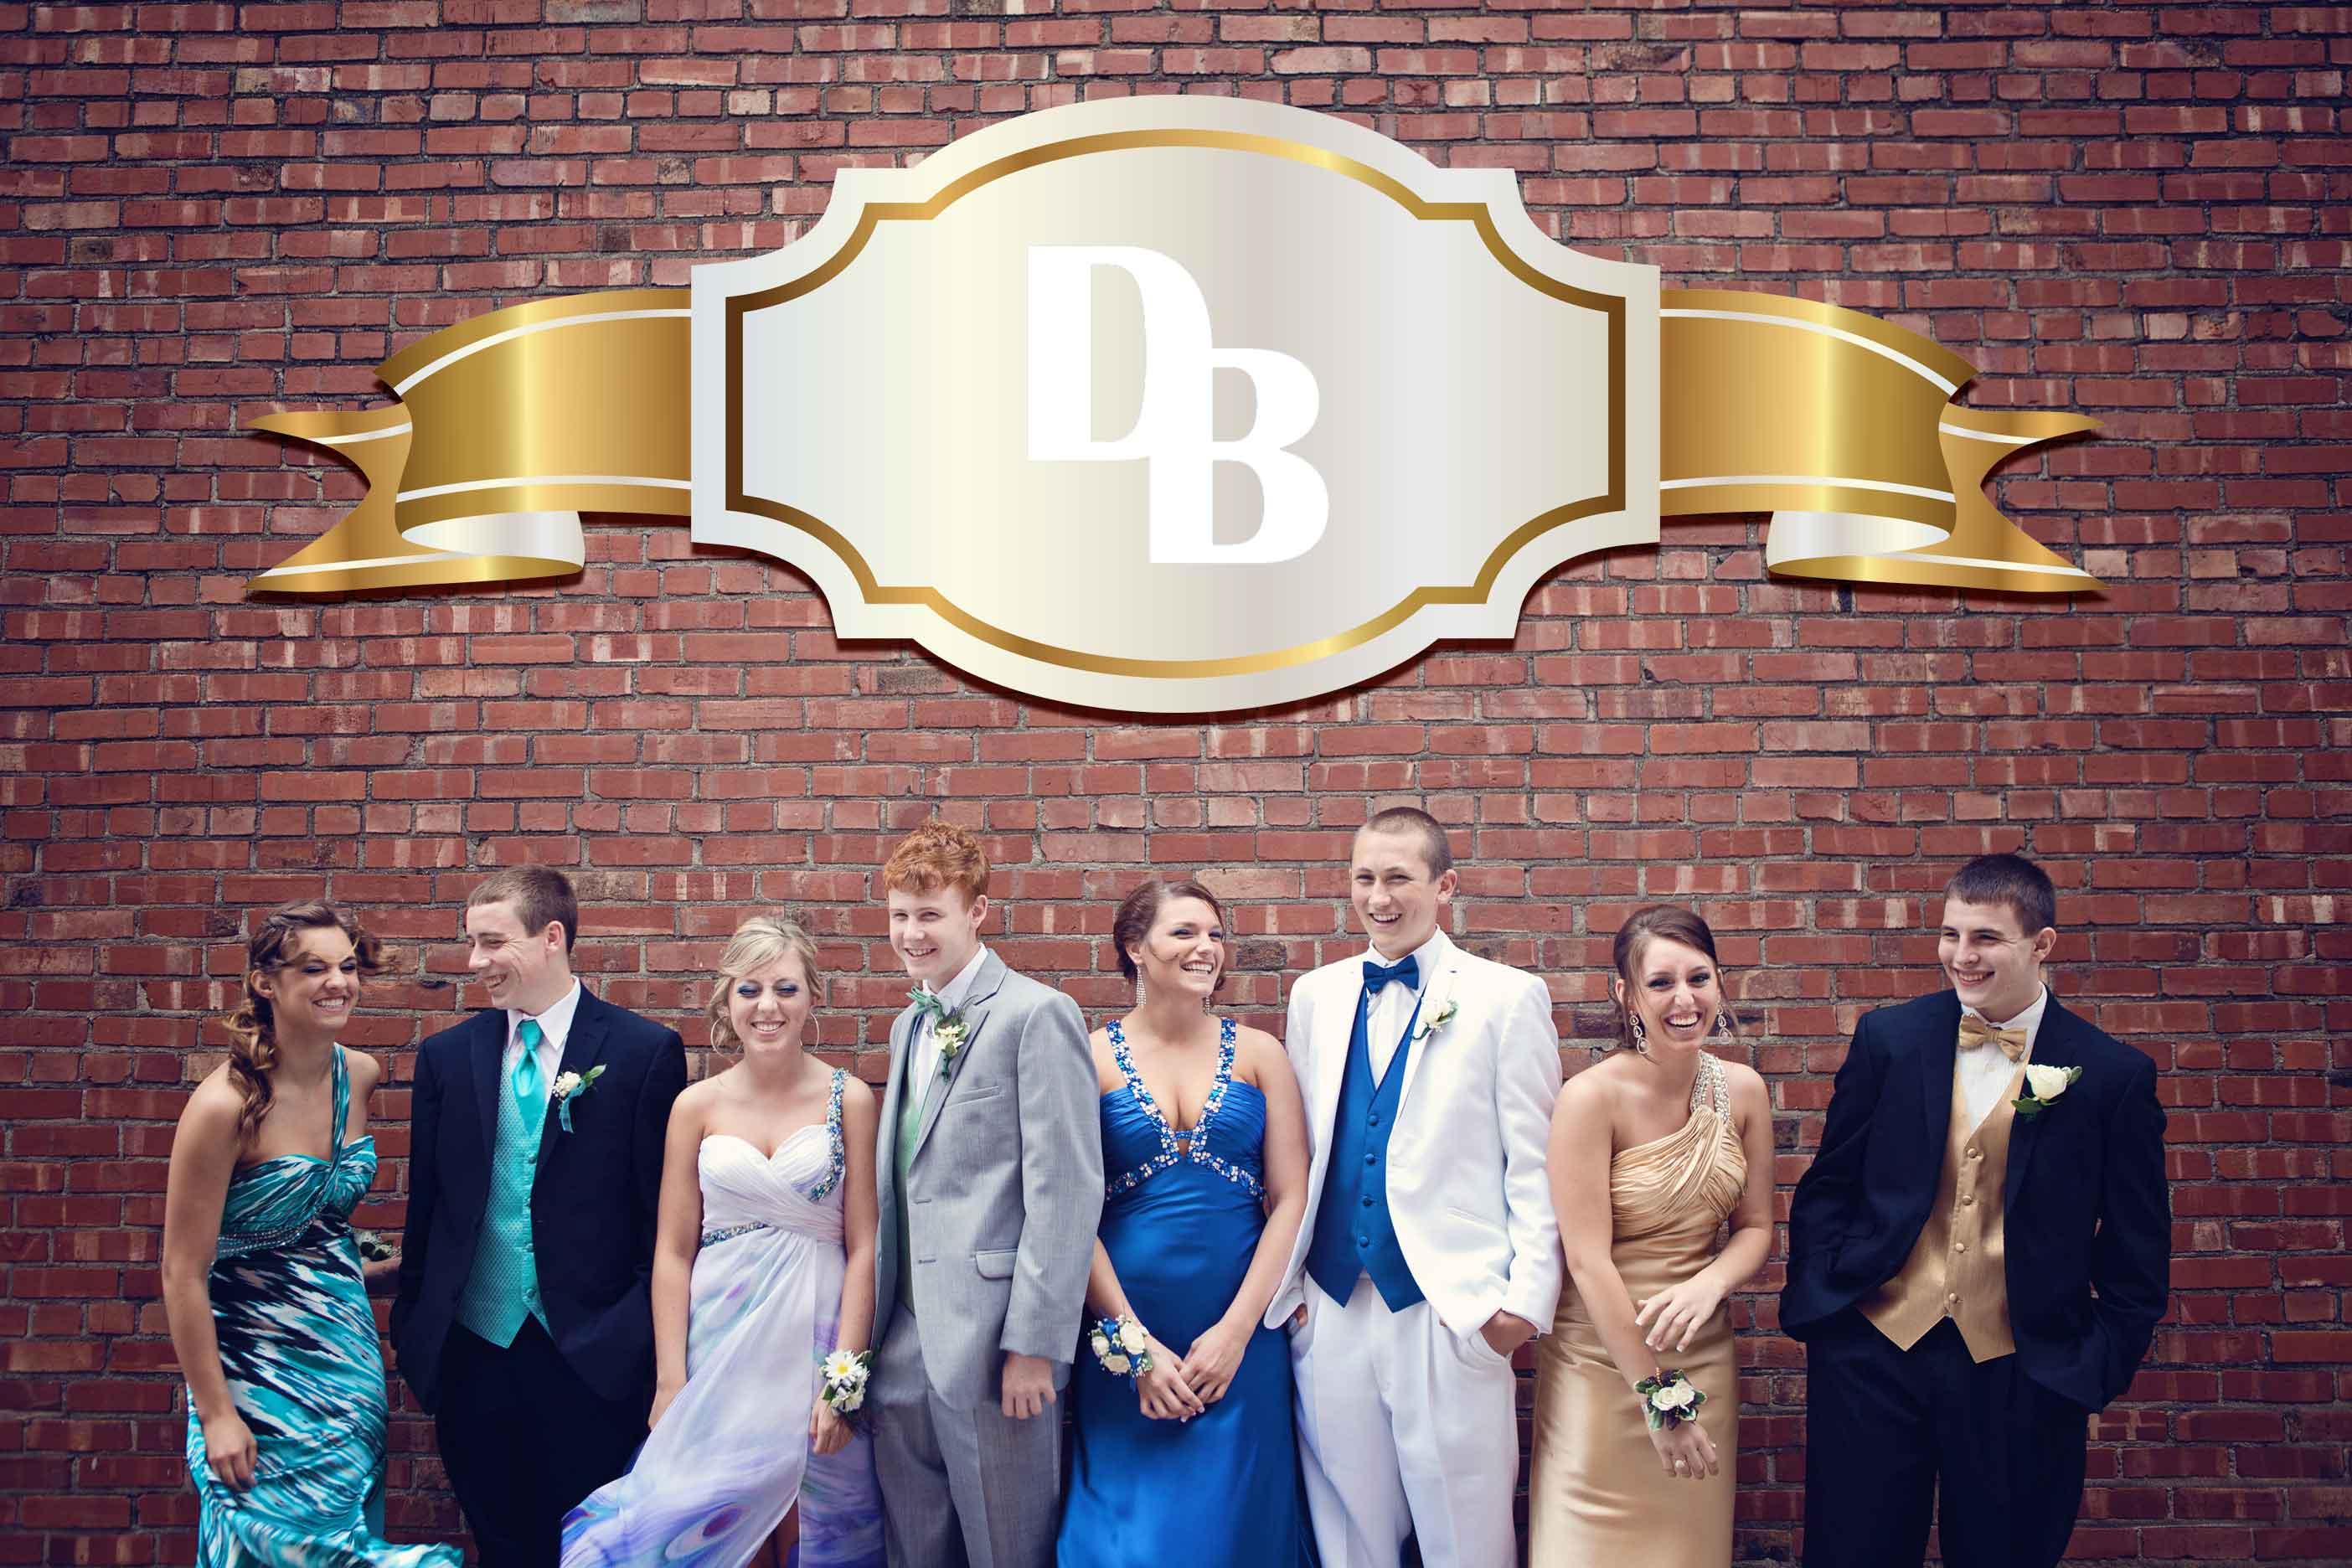 daniel boone area high school prom